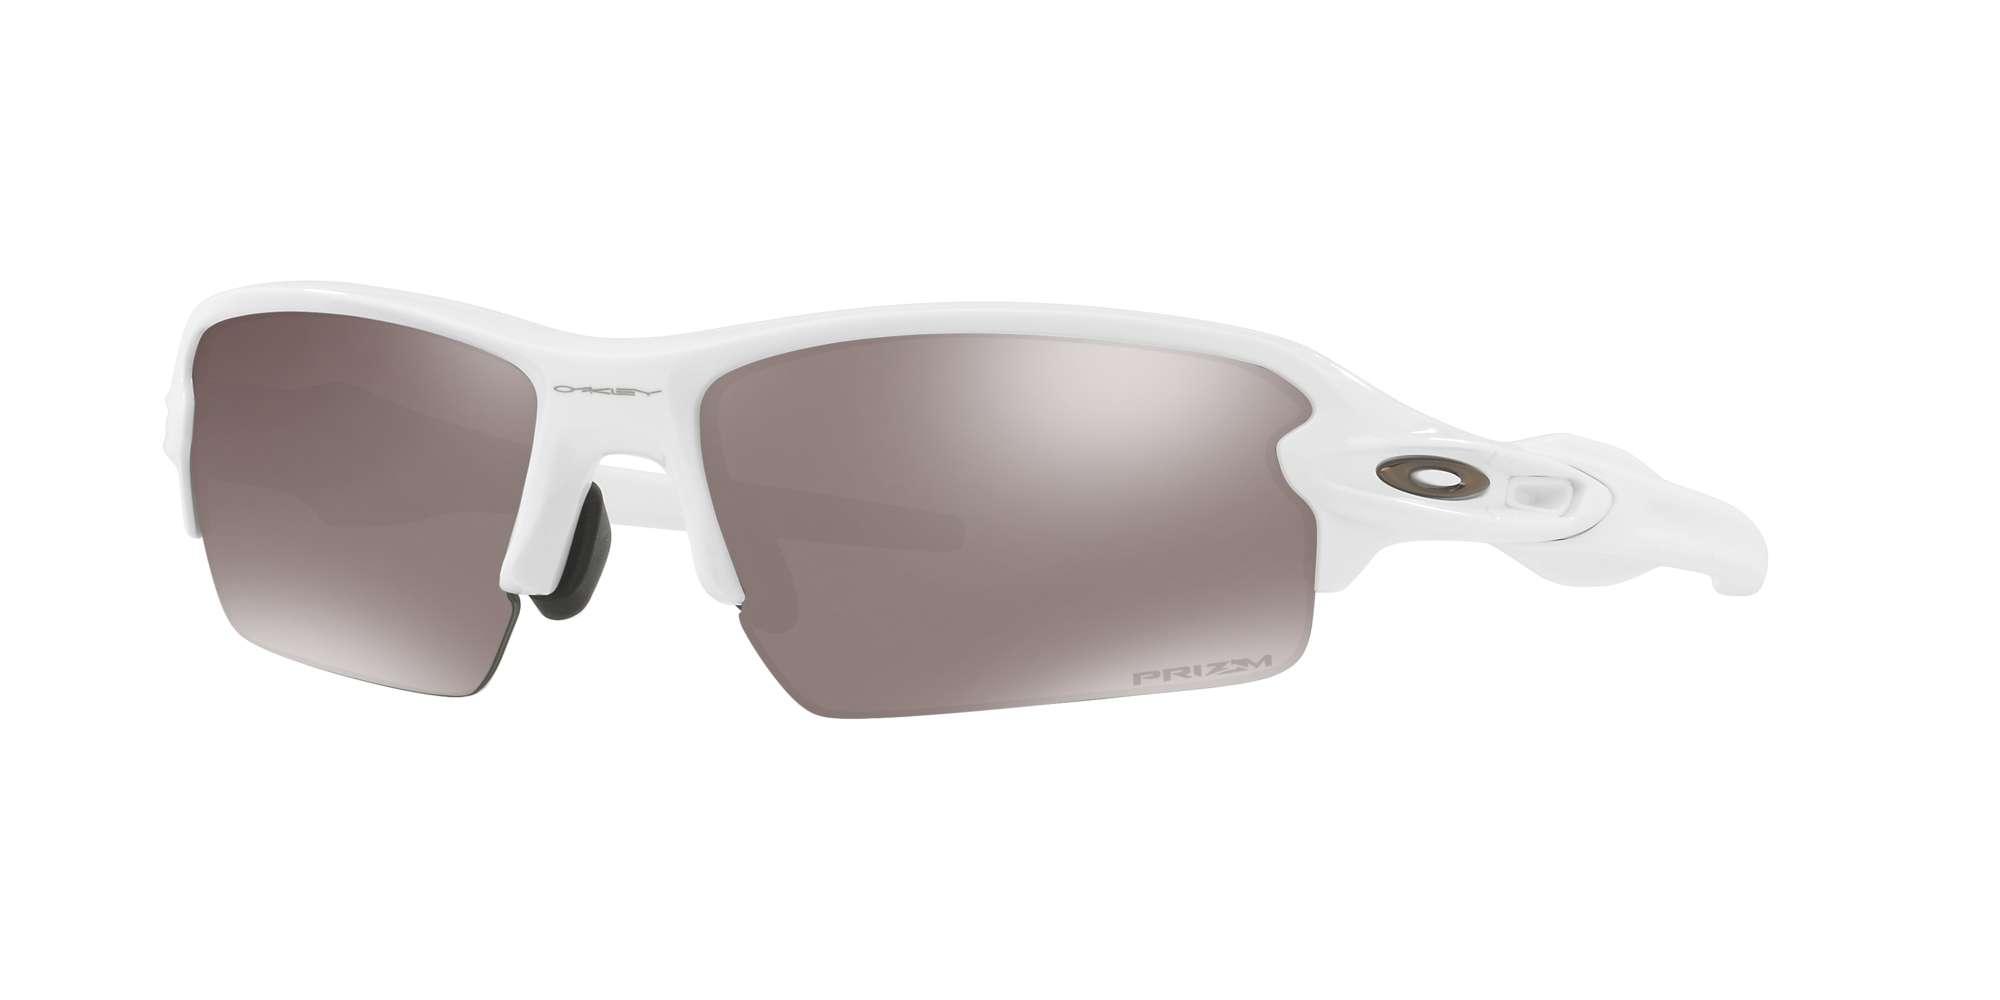 POLISHED WHITE / PRIZM BLACK POLARIZED lenses